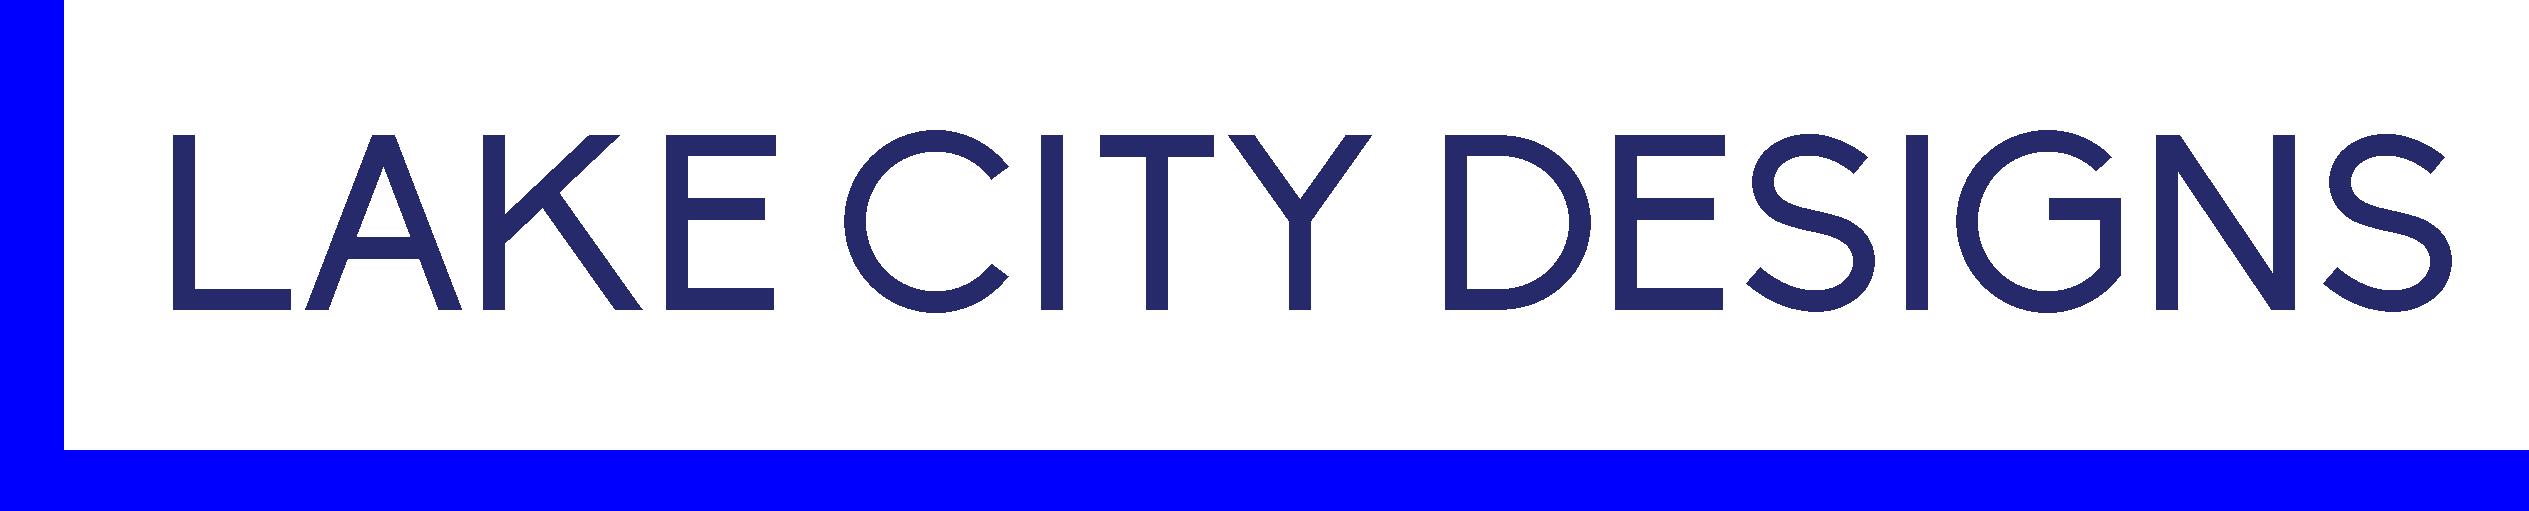 Lake City Designs